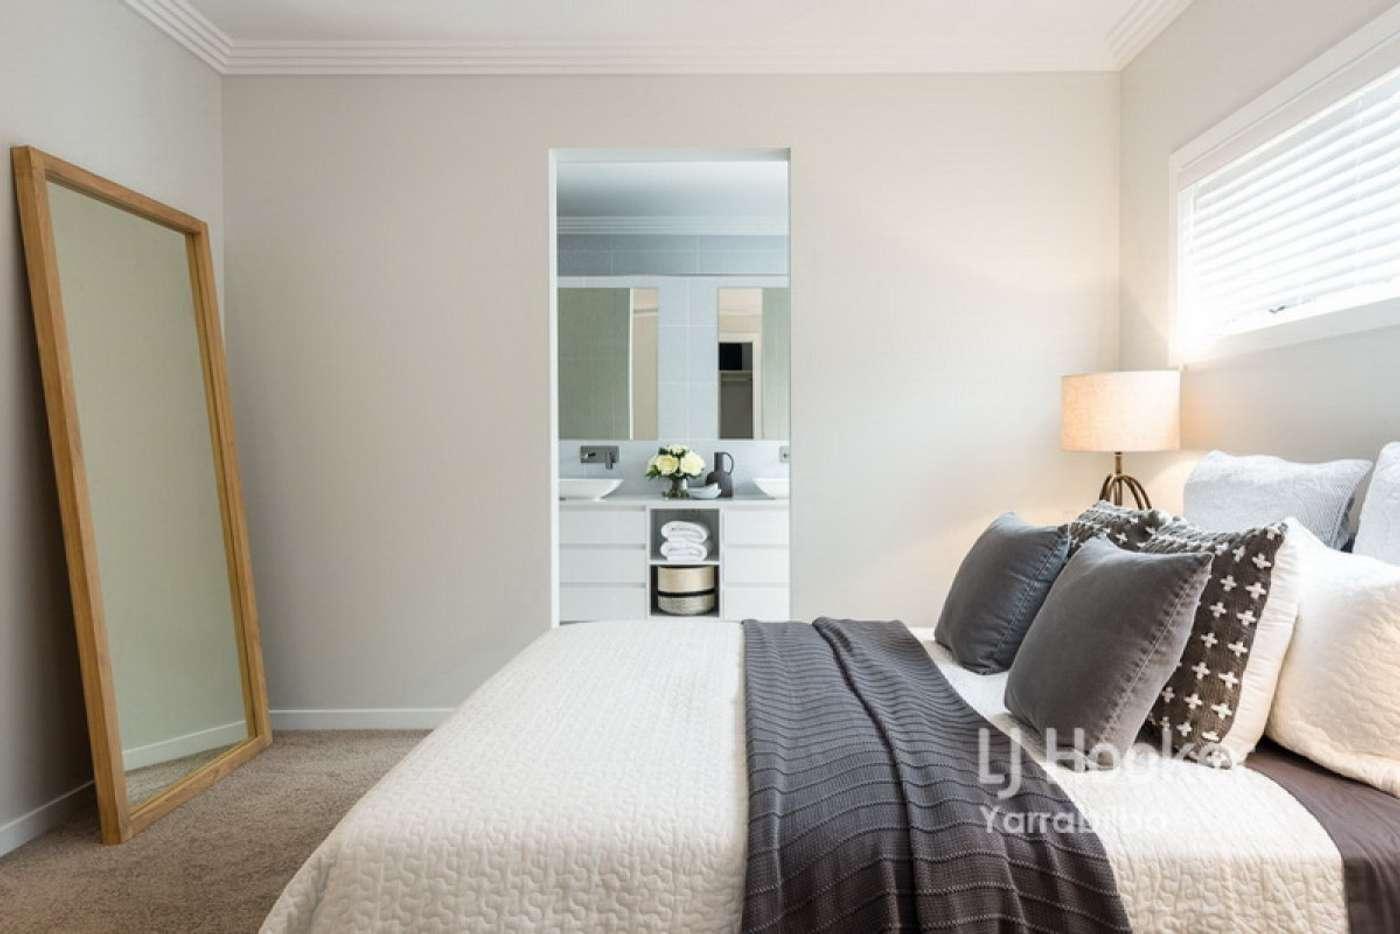 Seventh view of Homely house listing, 9 Mason Street, Yarrabilba QLD 4207